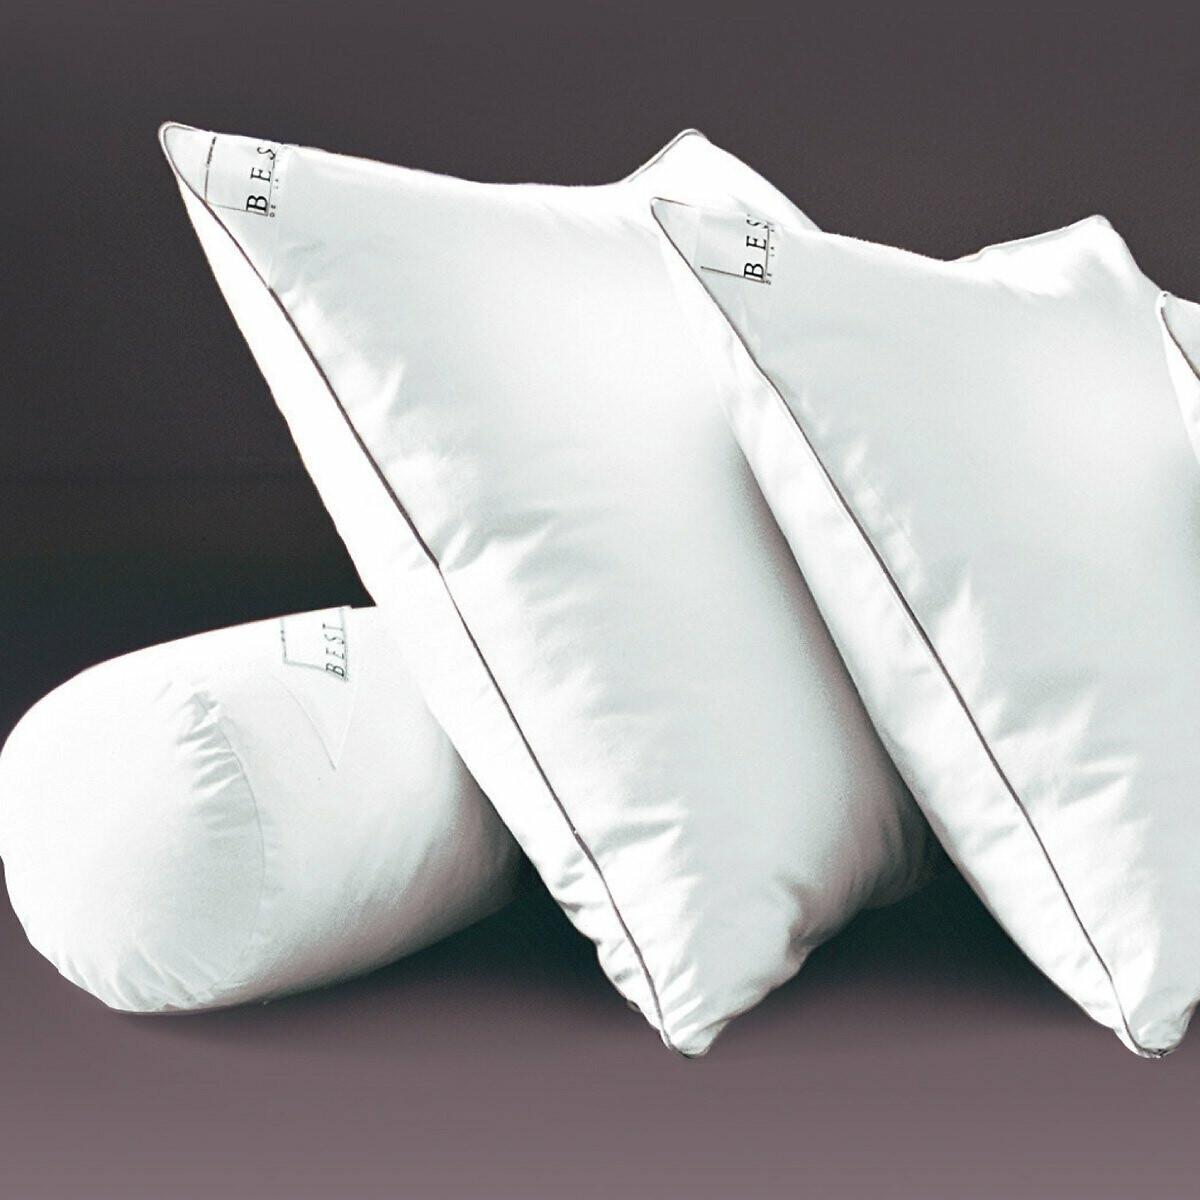 Фото - Подушка LaRedoute Упругая из латекса с обработкой proneem 40 x 60 см белый подушка laredoute жесткая из латекса с пропиткой proneem 50 x 70 см белый